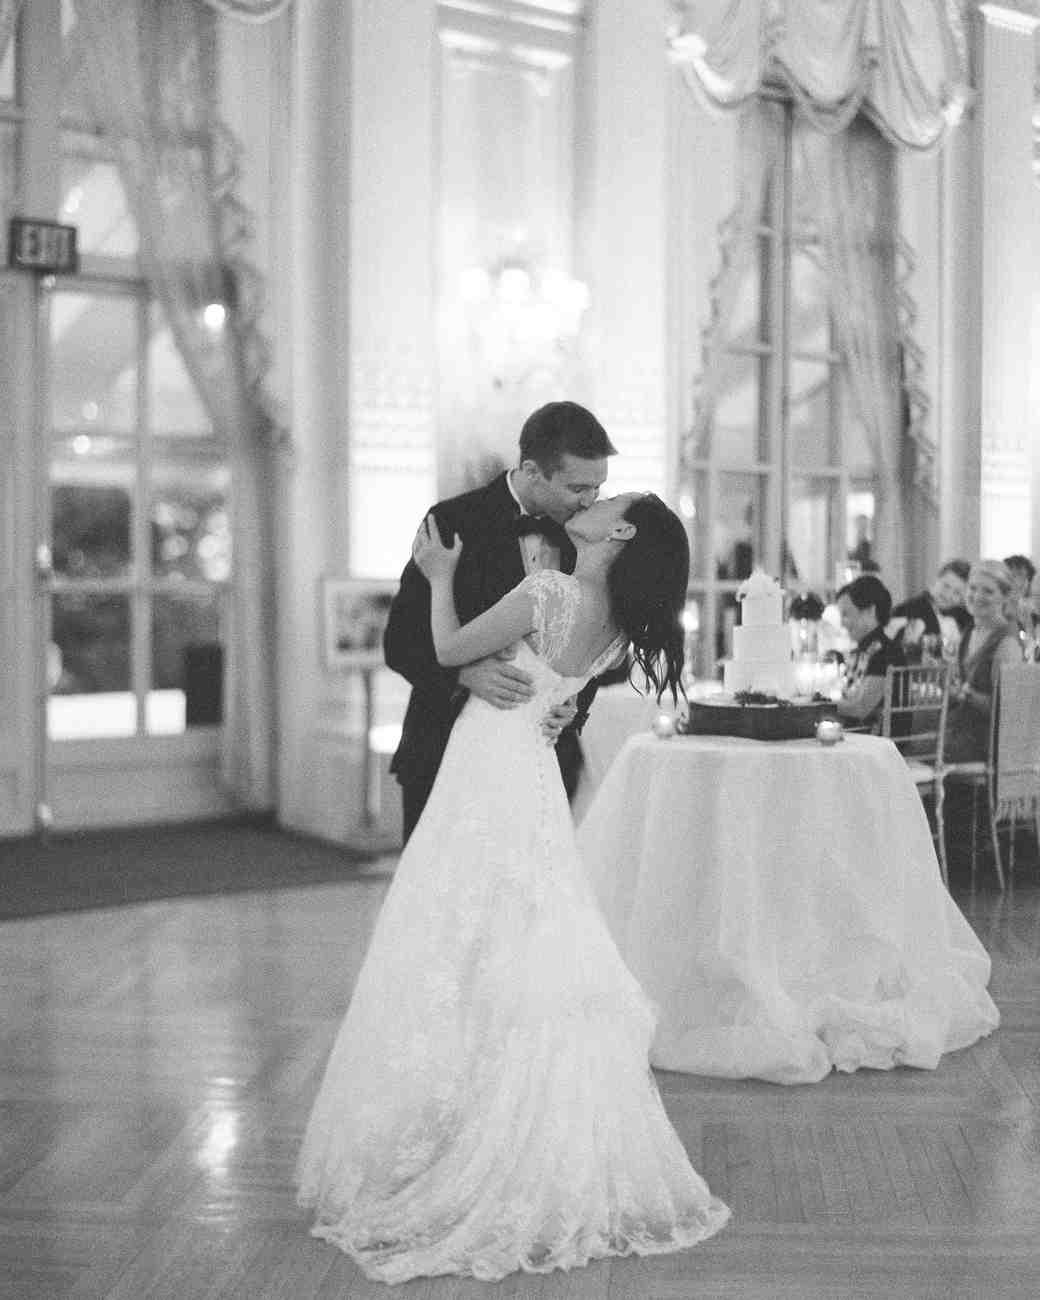 lissy-steven-wedding-newport-firstdance-144-elizabethmessina-s112907-0516.jpg